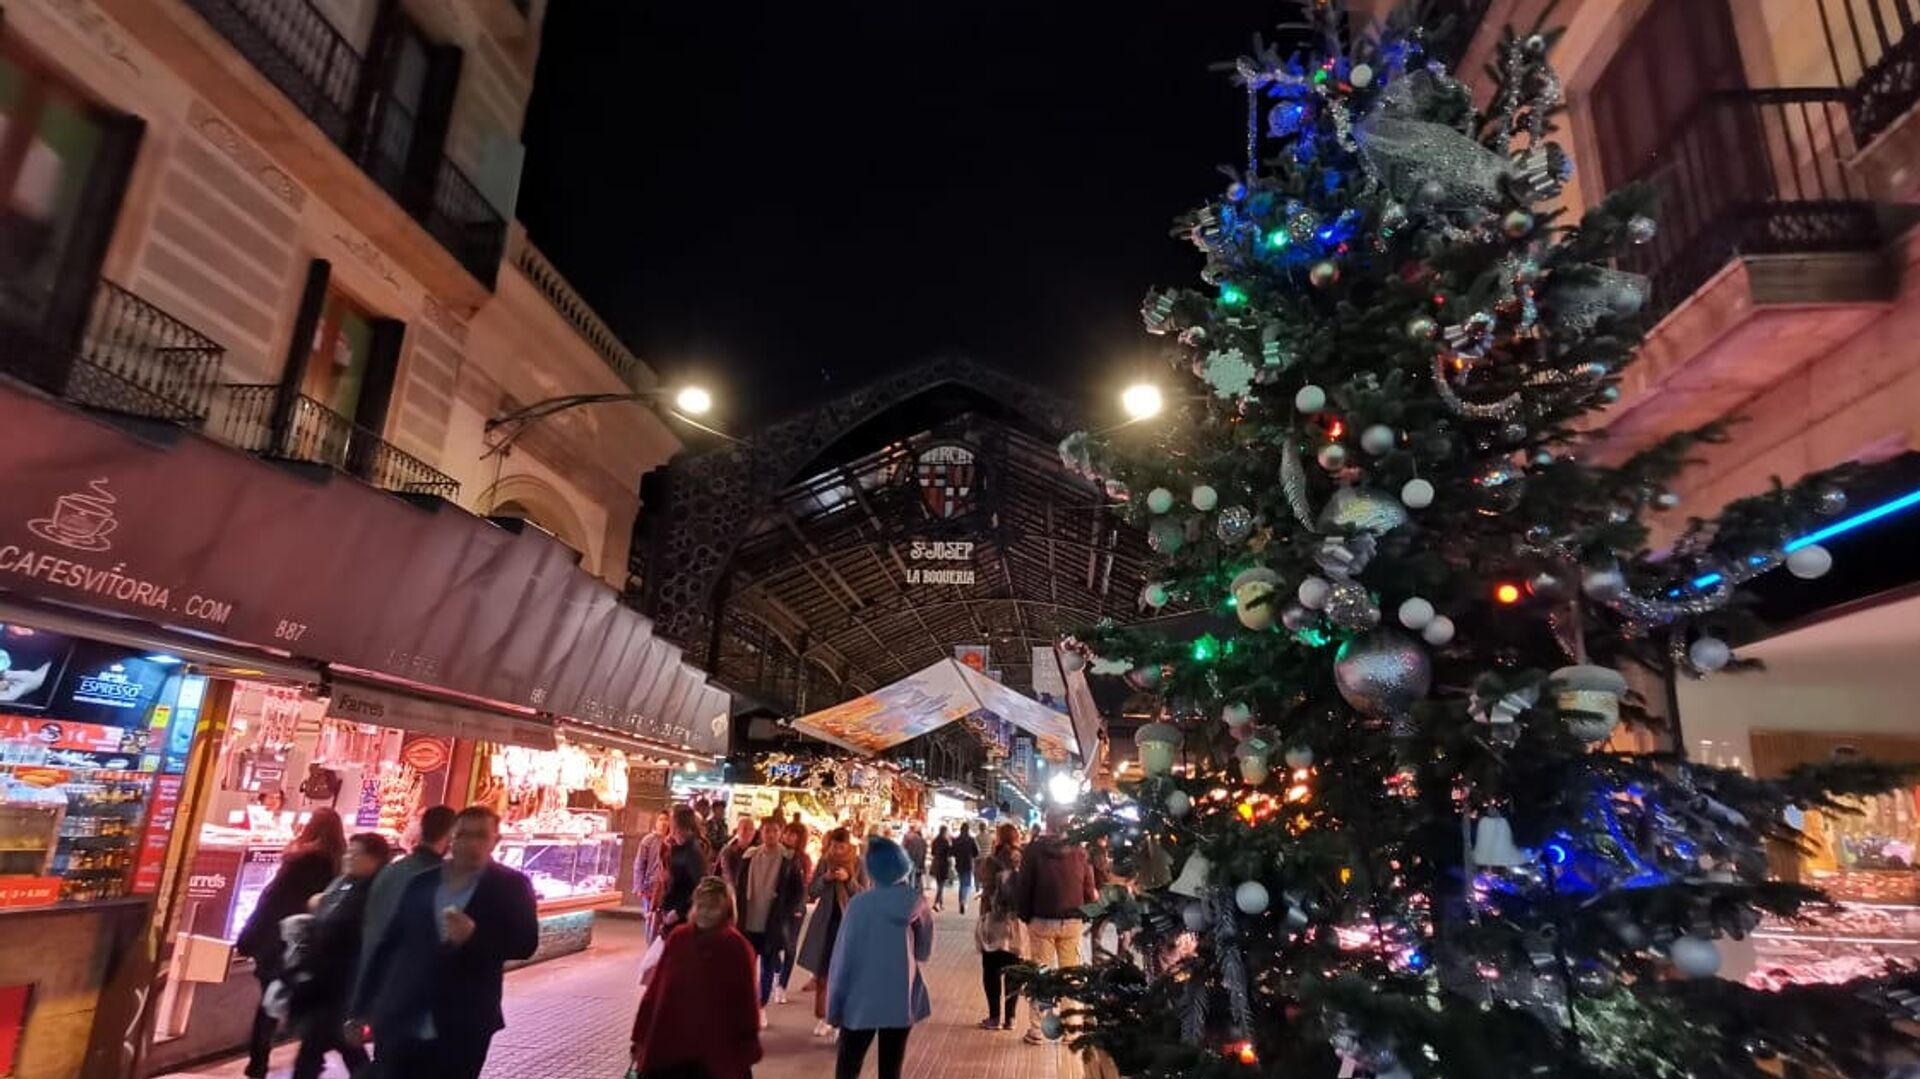 1562532464 0:98:1122:729 1920x0 80 0 0 9f28f0aa40298e3875054f963b5d7a97 - В Испании объявили об ограничениях в рождественскую и новогоднюю ночь